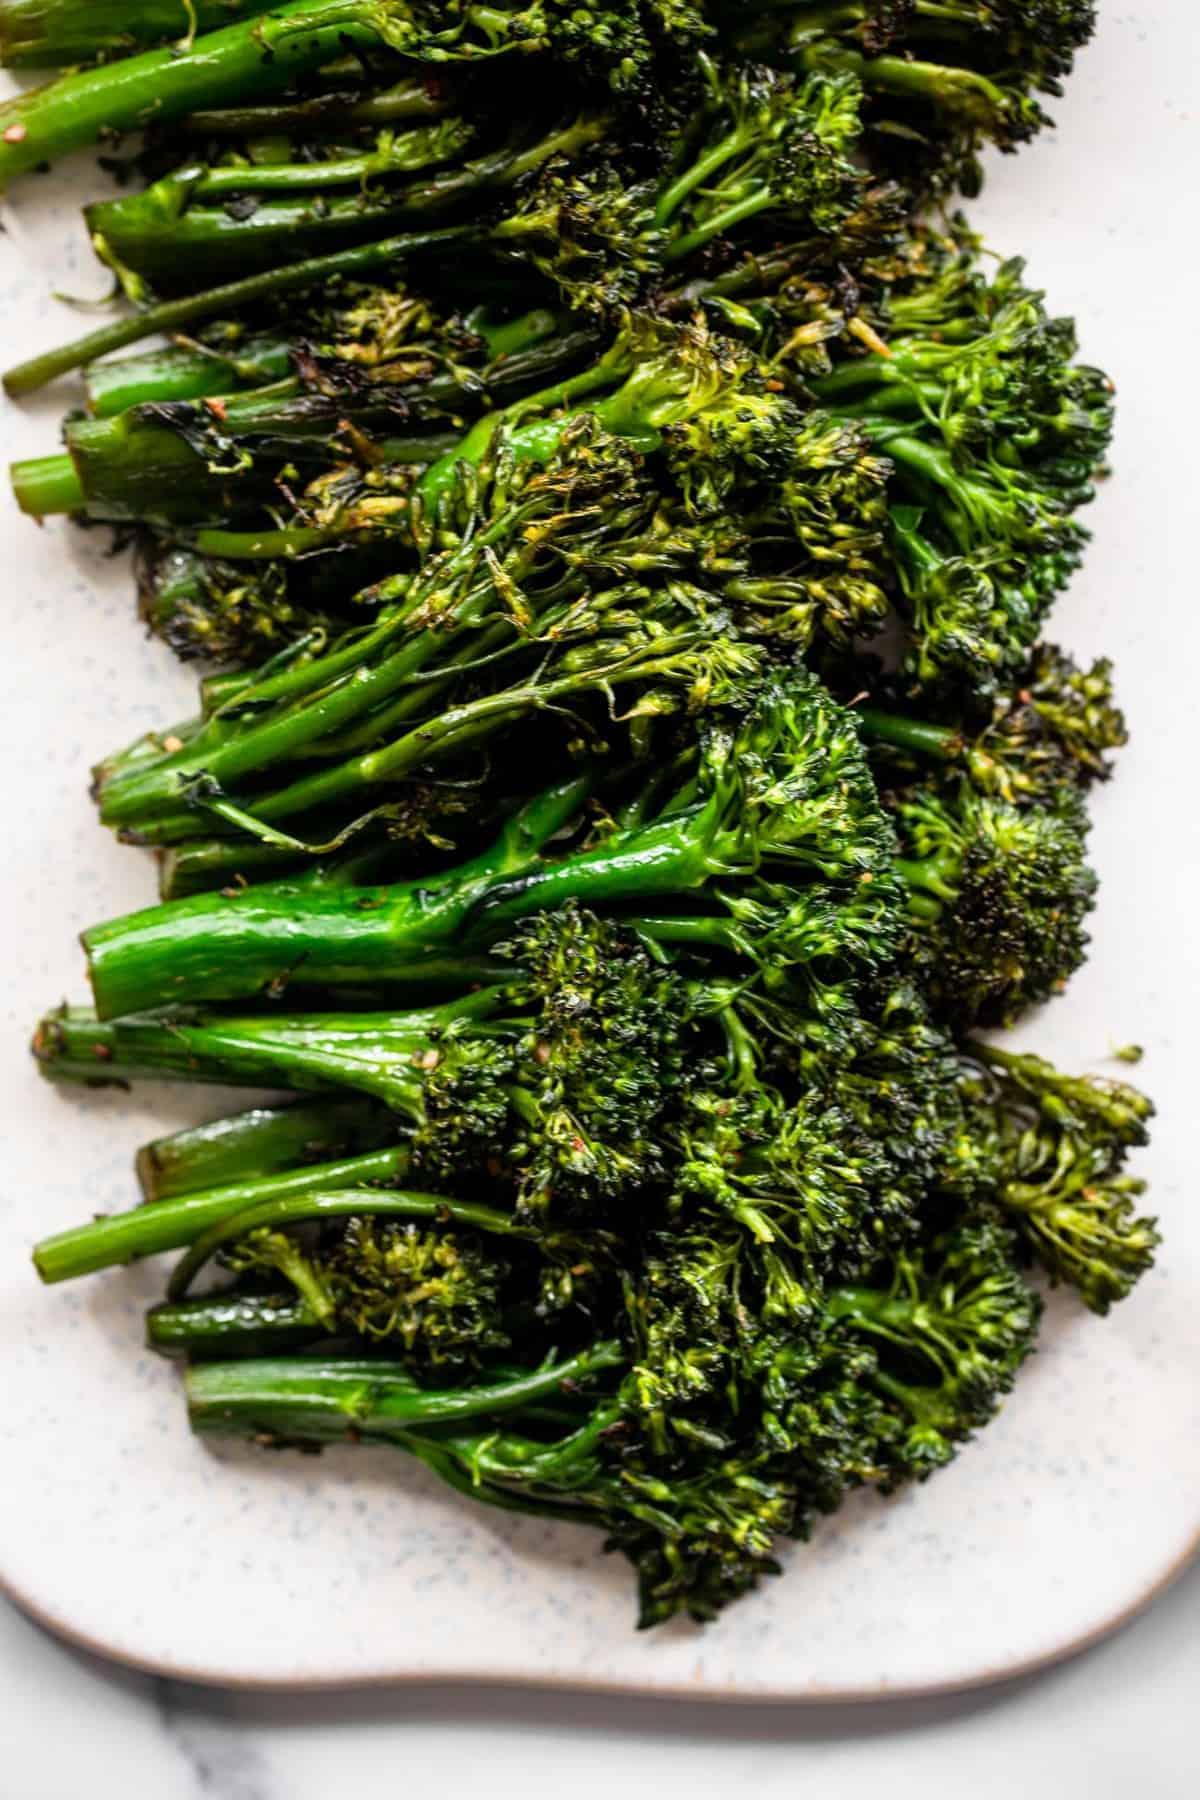 Sautéed broccoli close up on a board